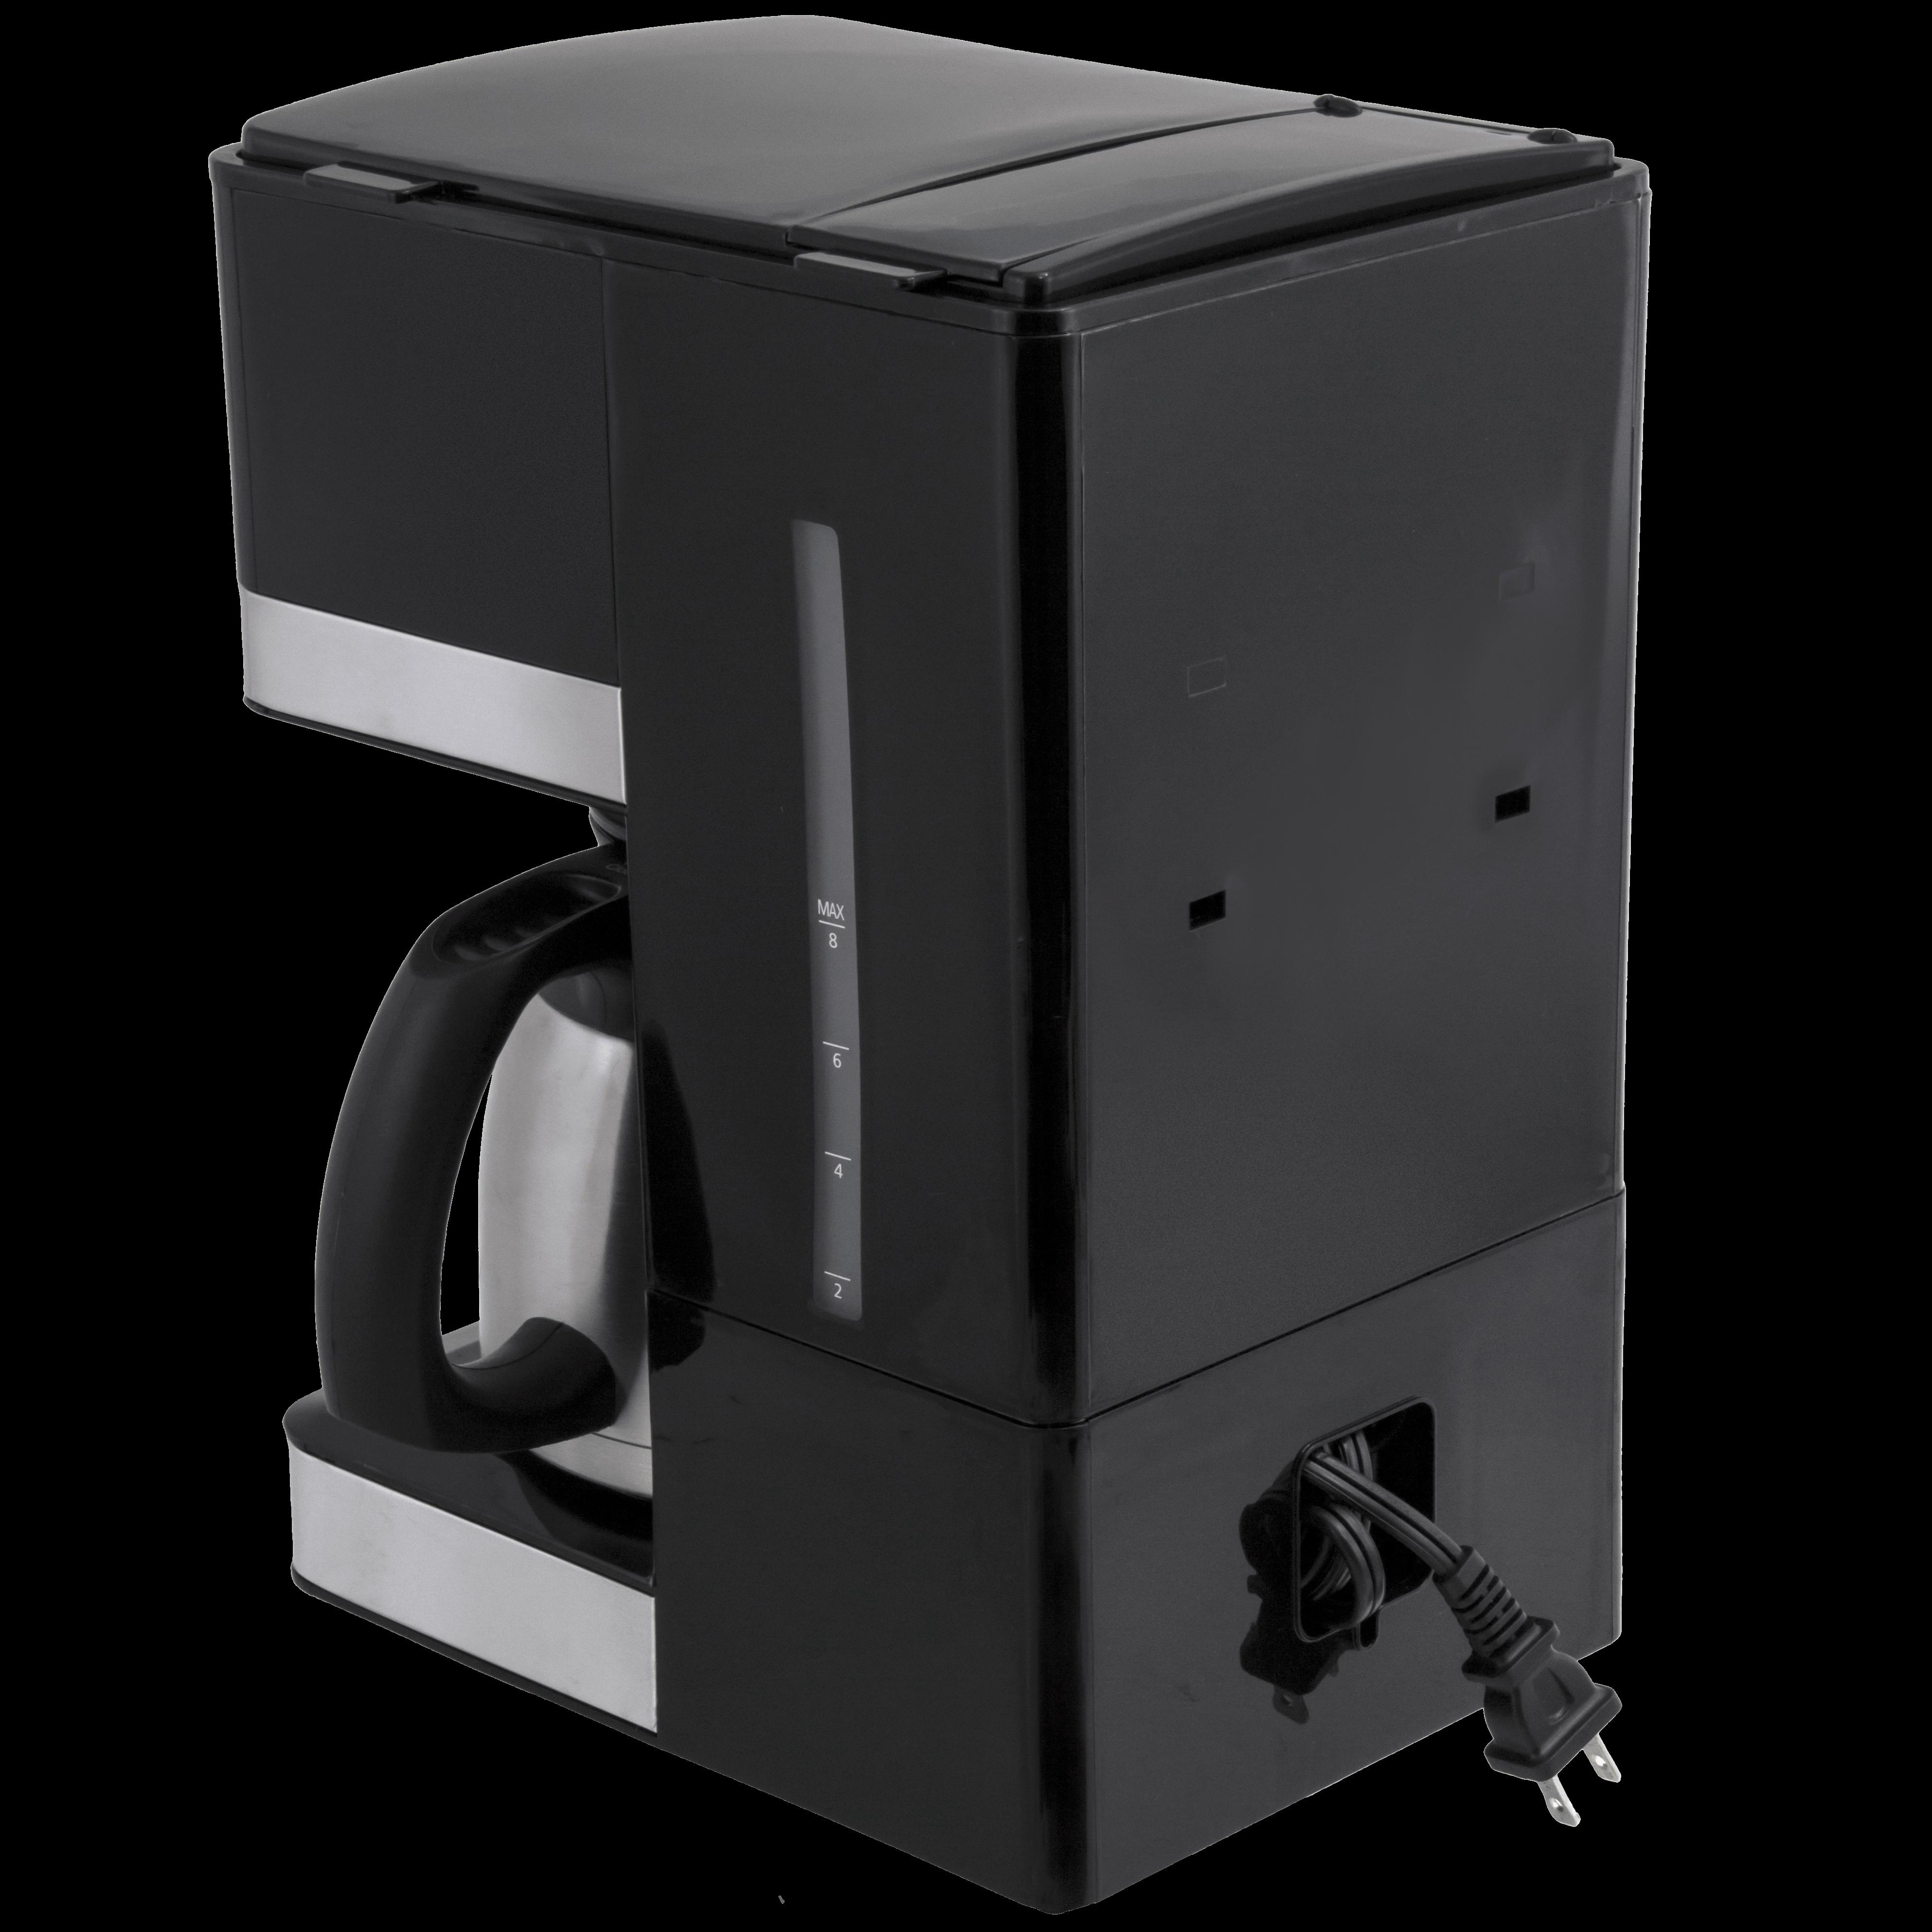 Mr Coffee Thermal Coffee Maker 8 Cup : Mr. Coffee Coffee Maker with 8-Cup Thermal Carafe